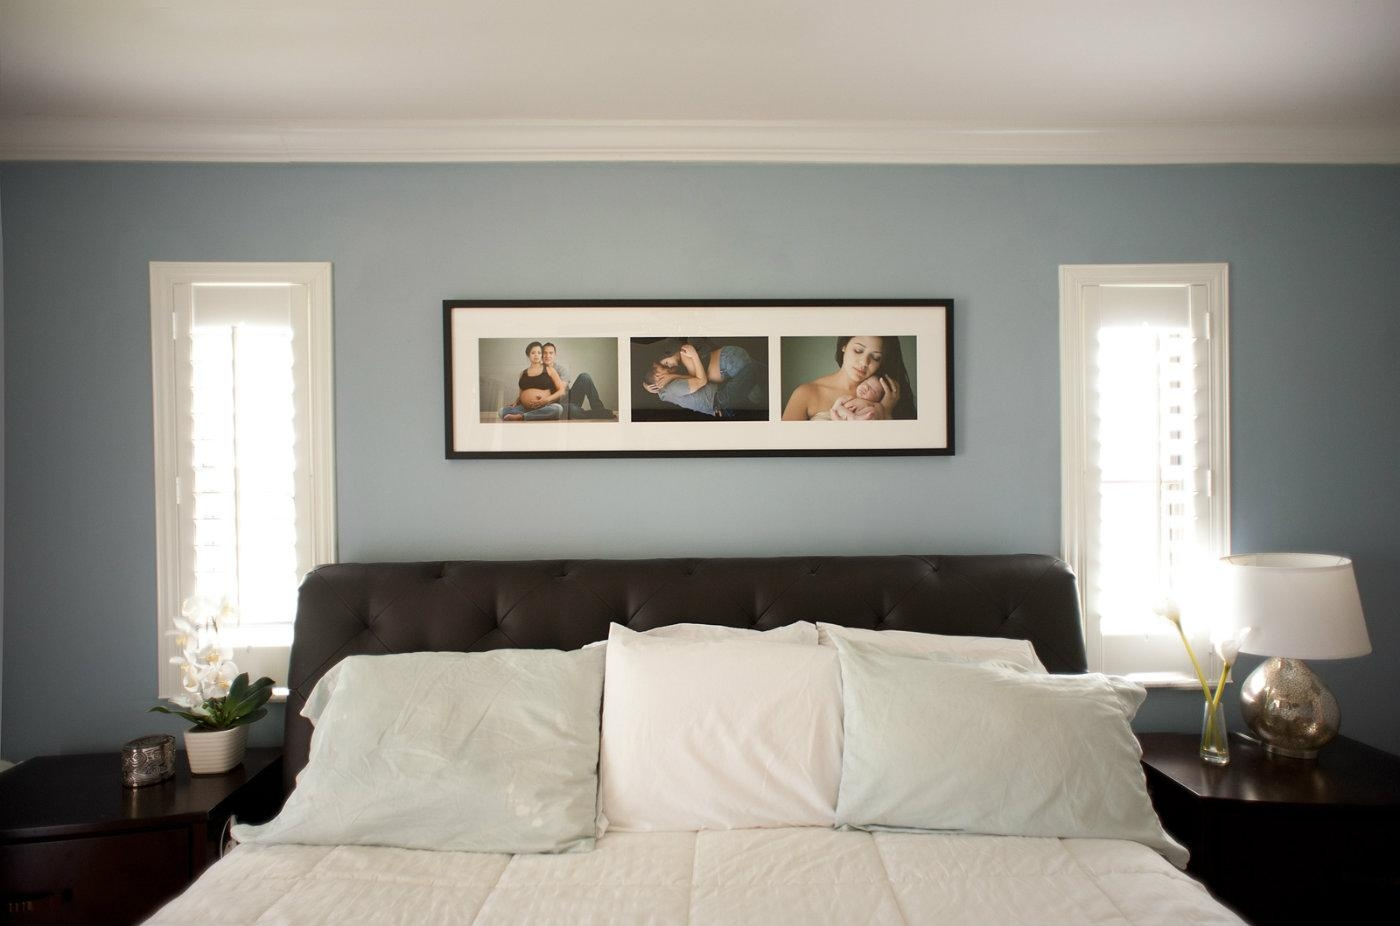 Bedroom Wall Art – Helpformycredit Inside Bed Wall Art (View 5 of 20)